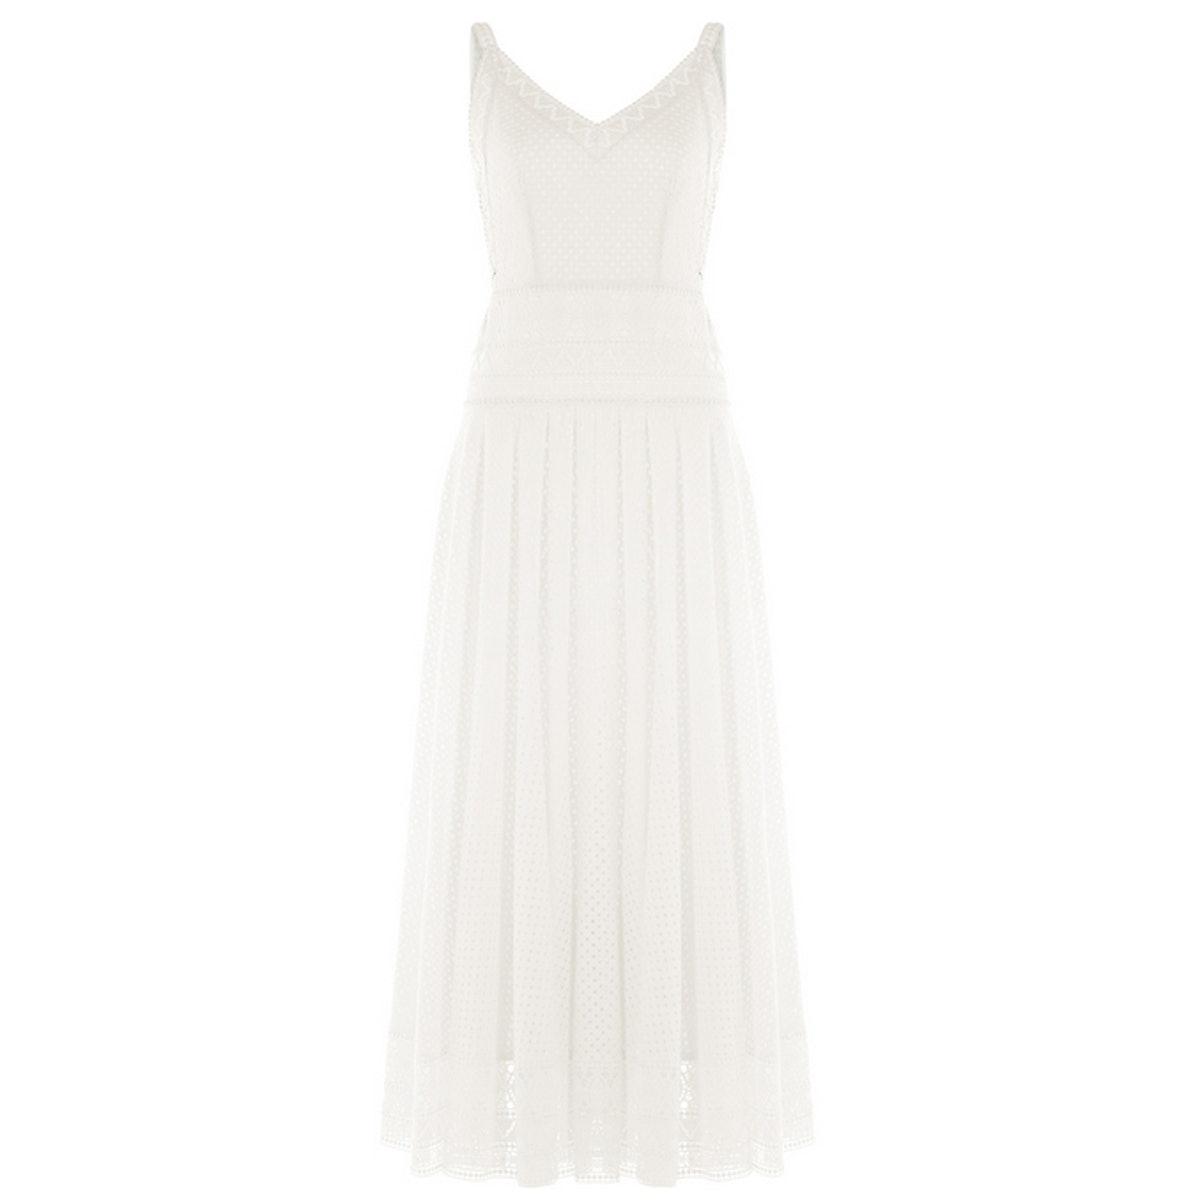 Philosophy Di Lorenzo Serafini Cotton Blend Dress